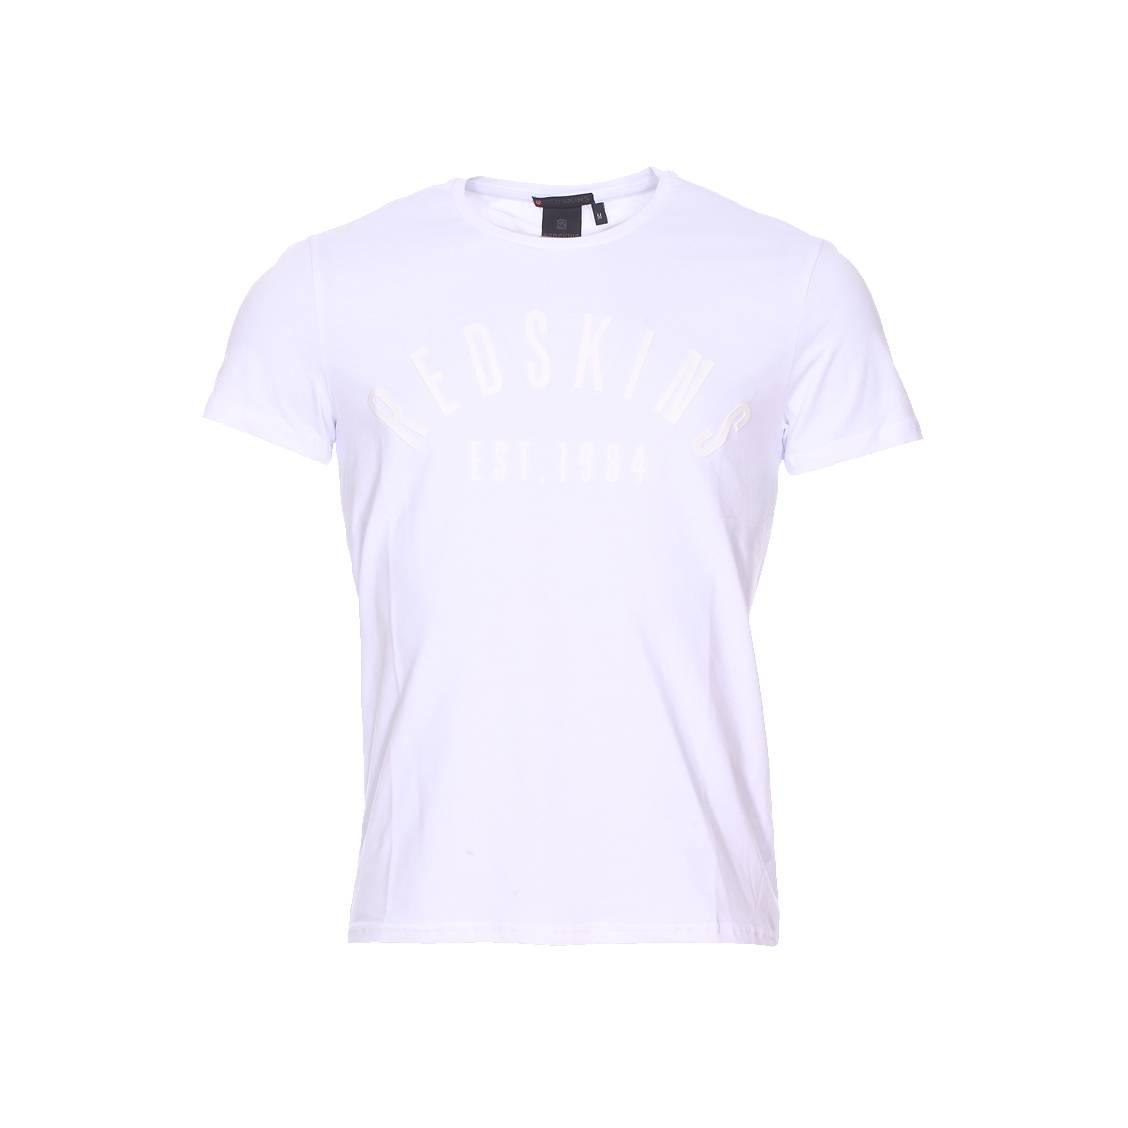 Tee-shirt col rond  malcolm calder blanc